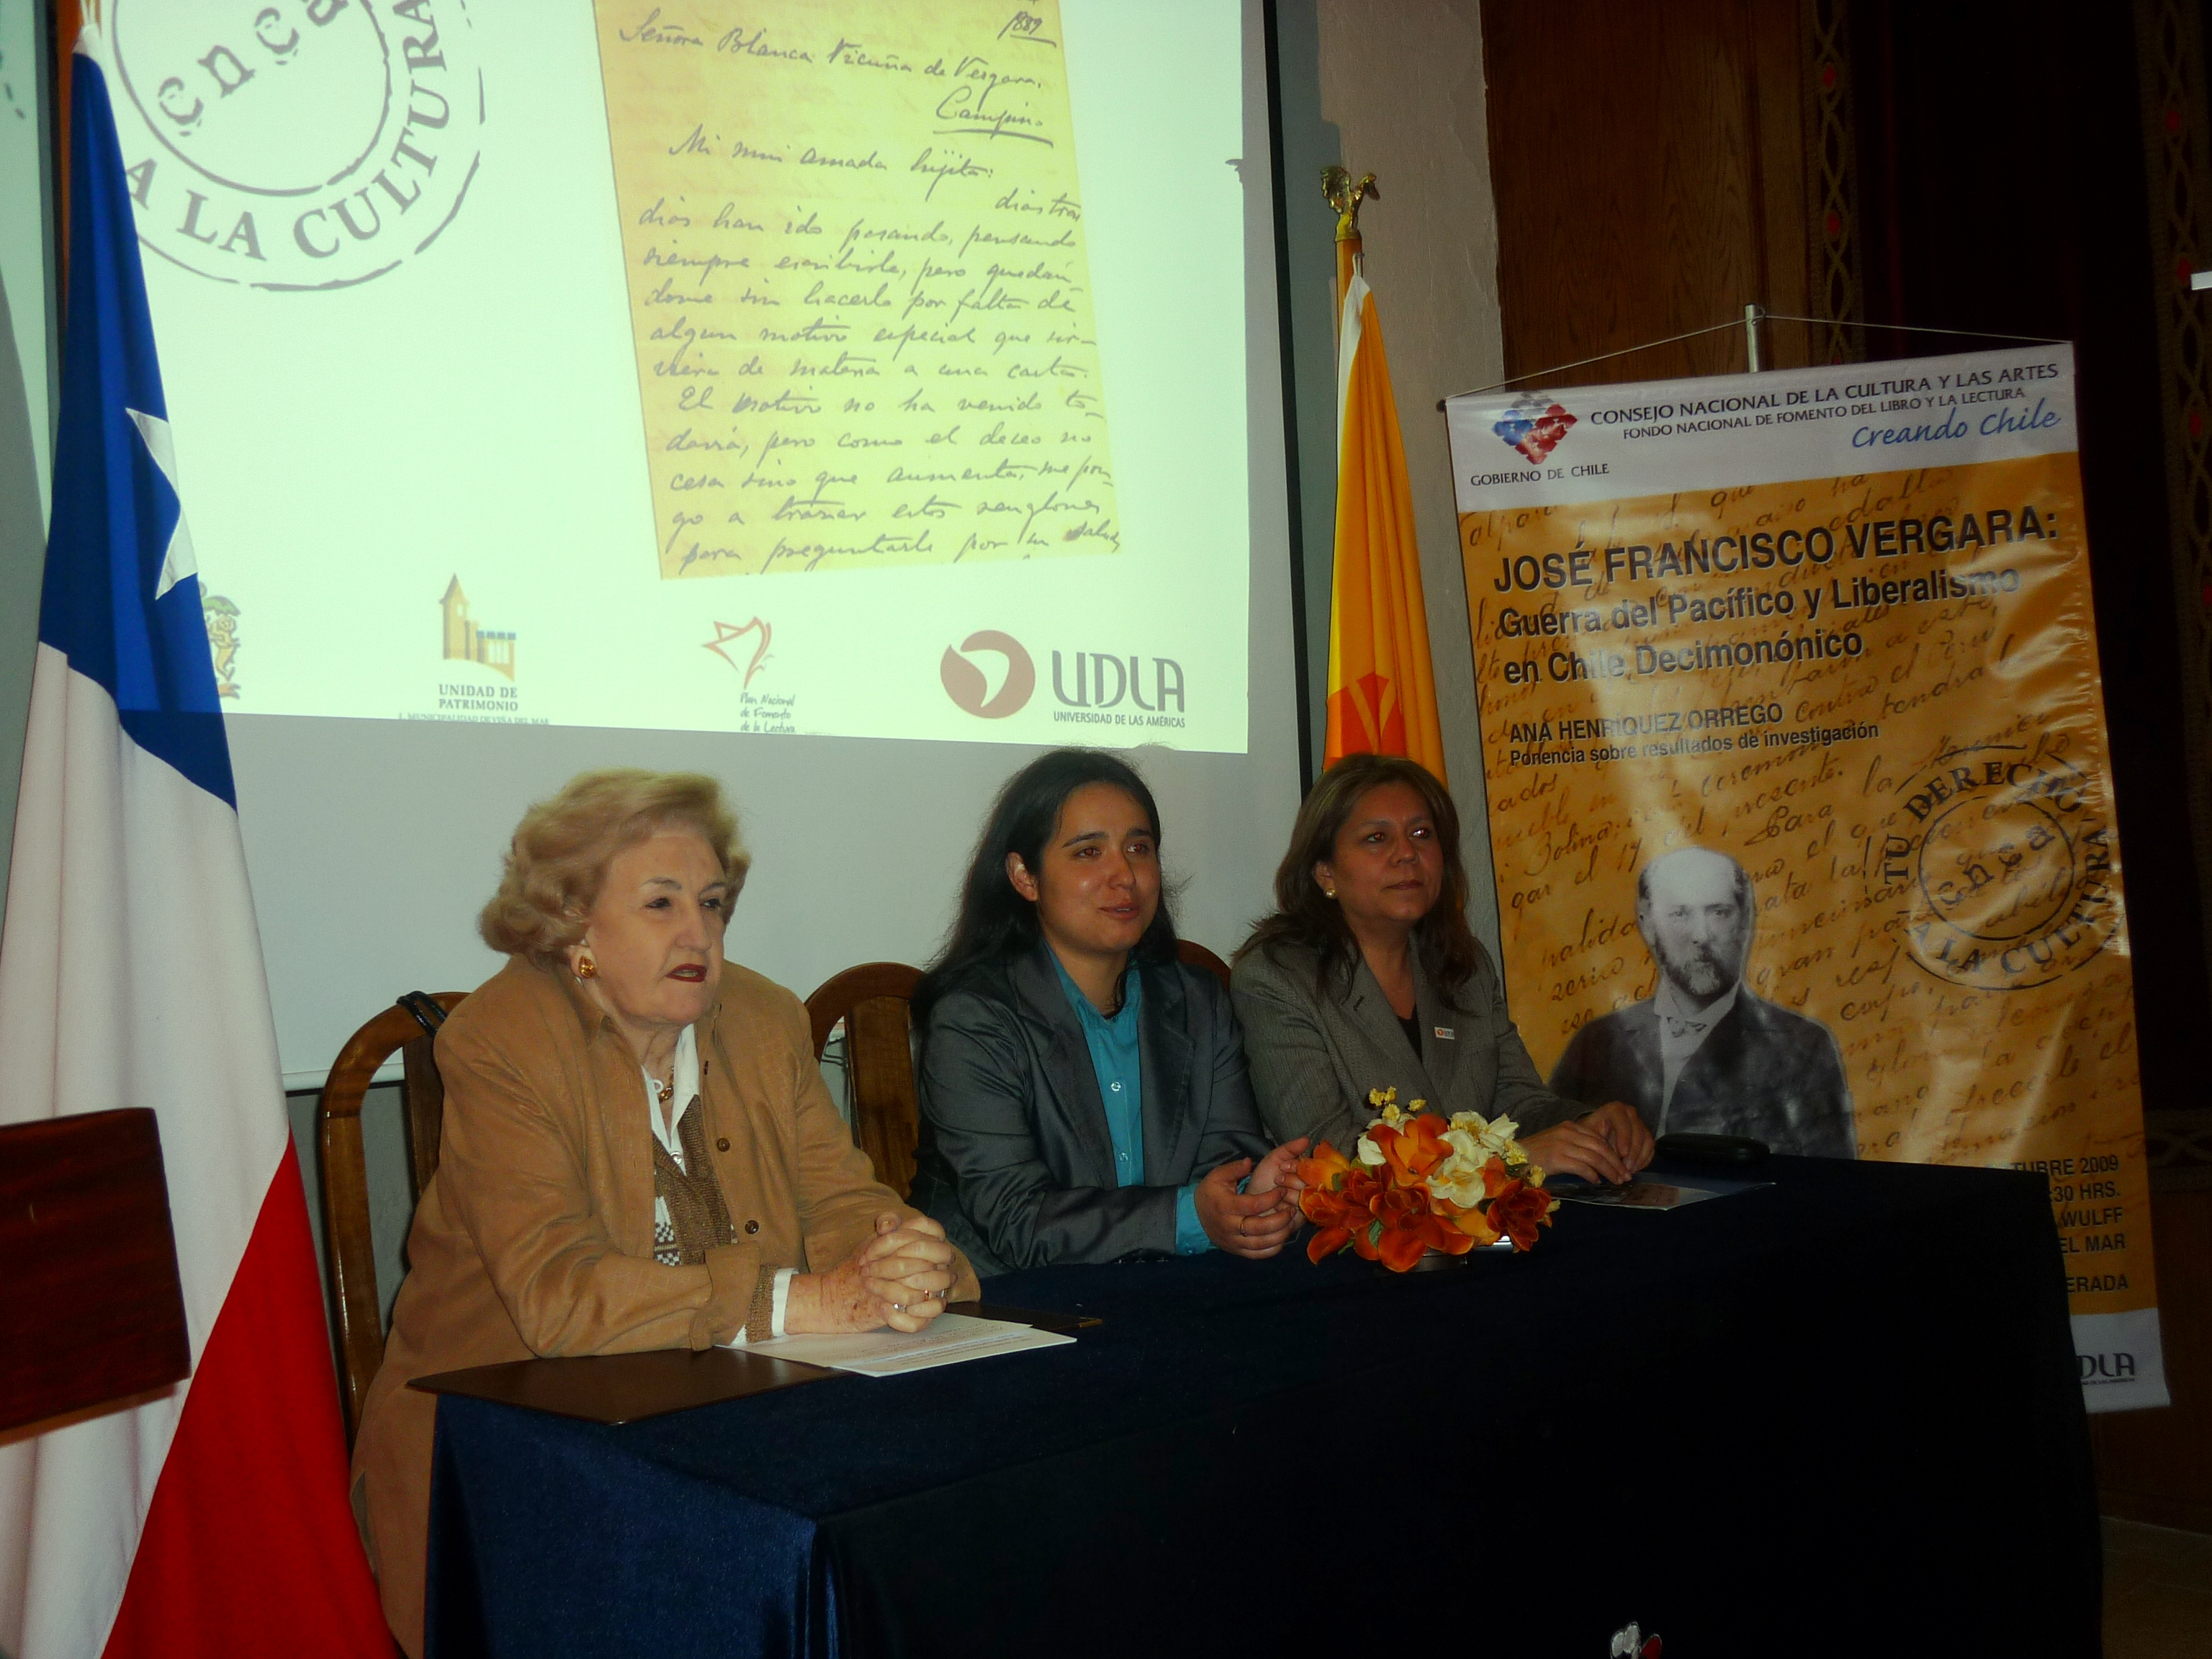 Eugenia Garrido, Ana Henriquez, Jeanette Rivera (JFV). 21 OCT. 2009